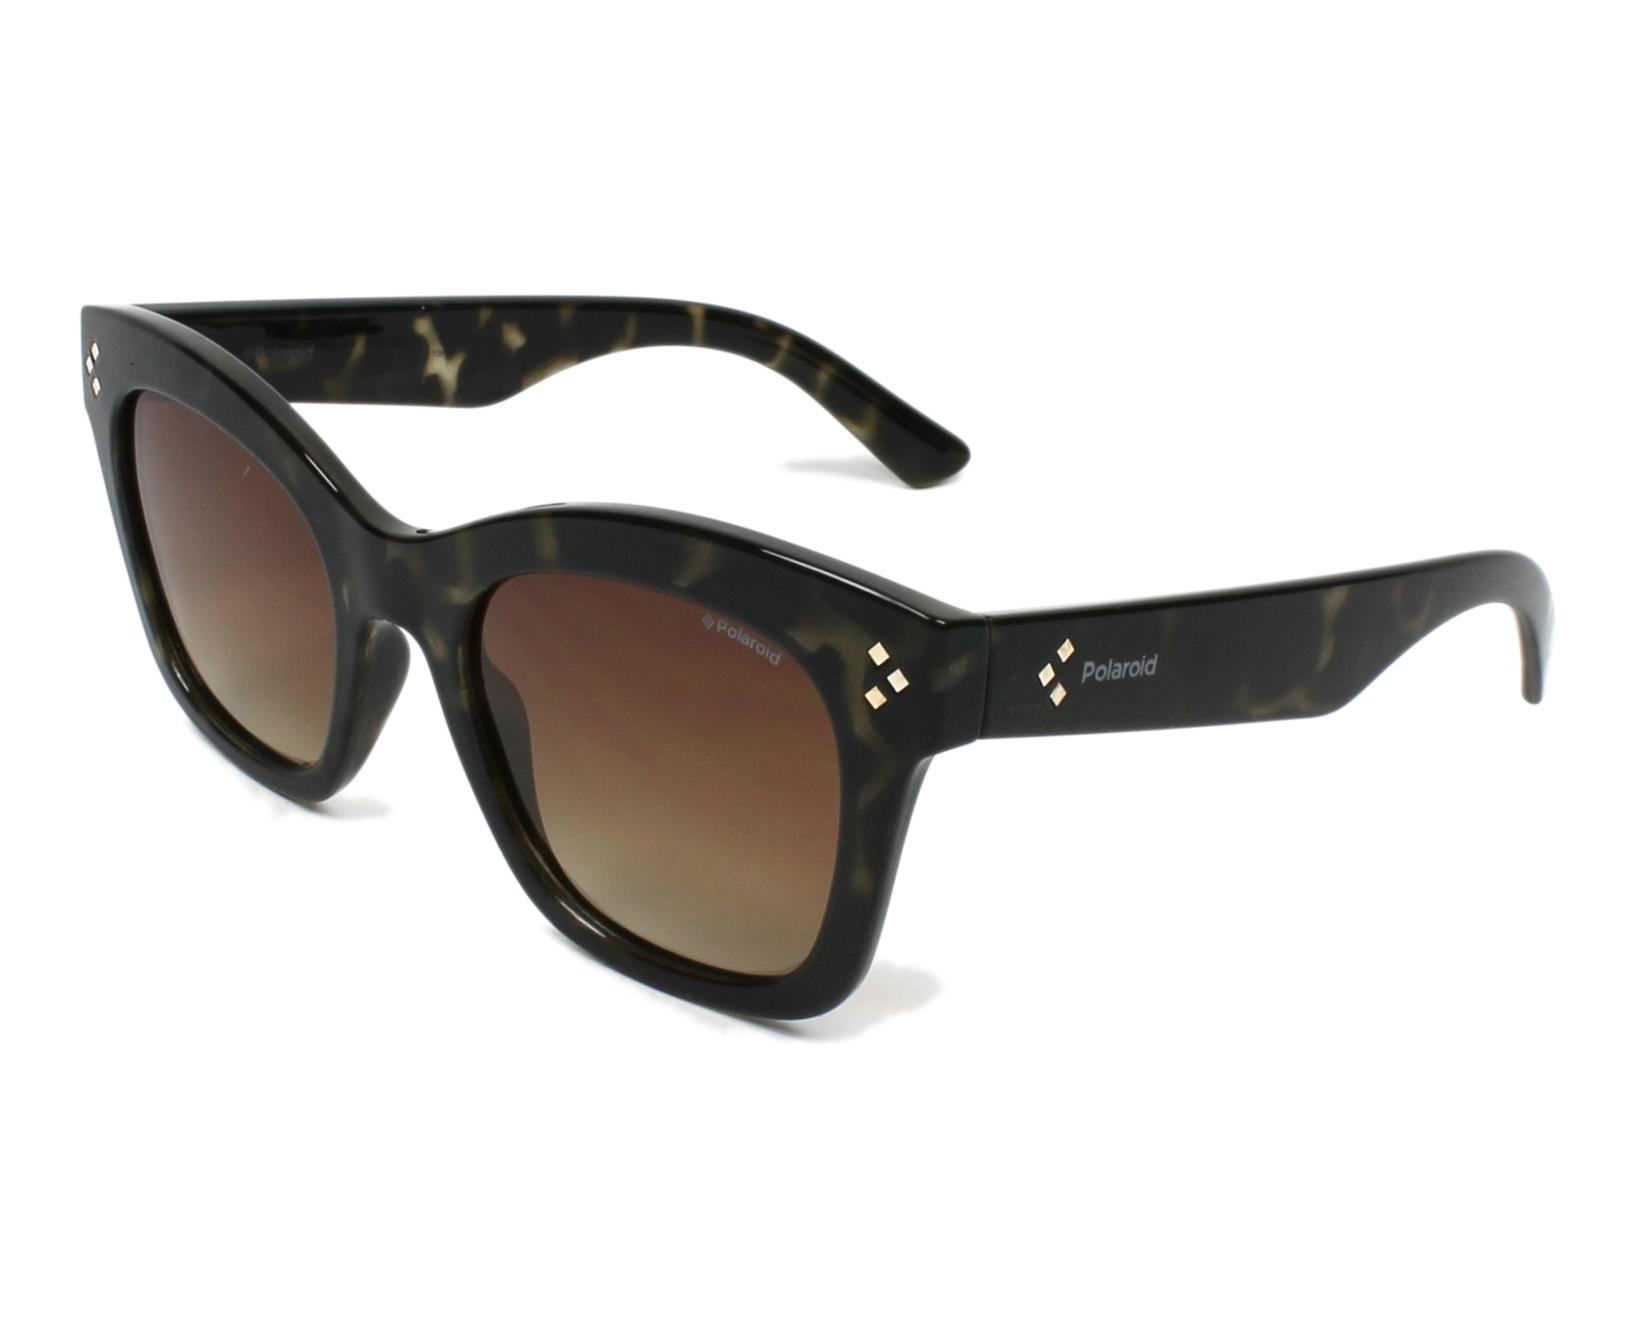 Sonnenbrille (PLD 4039/S) Polaroid GjUBg